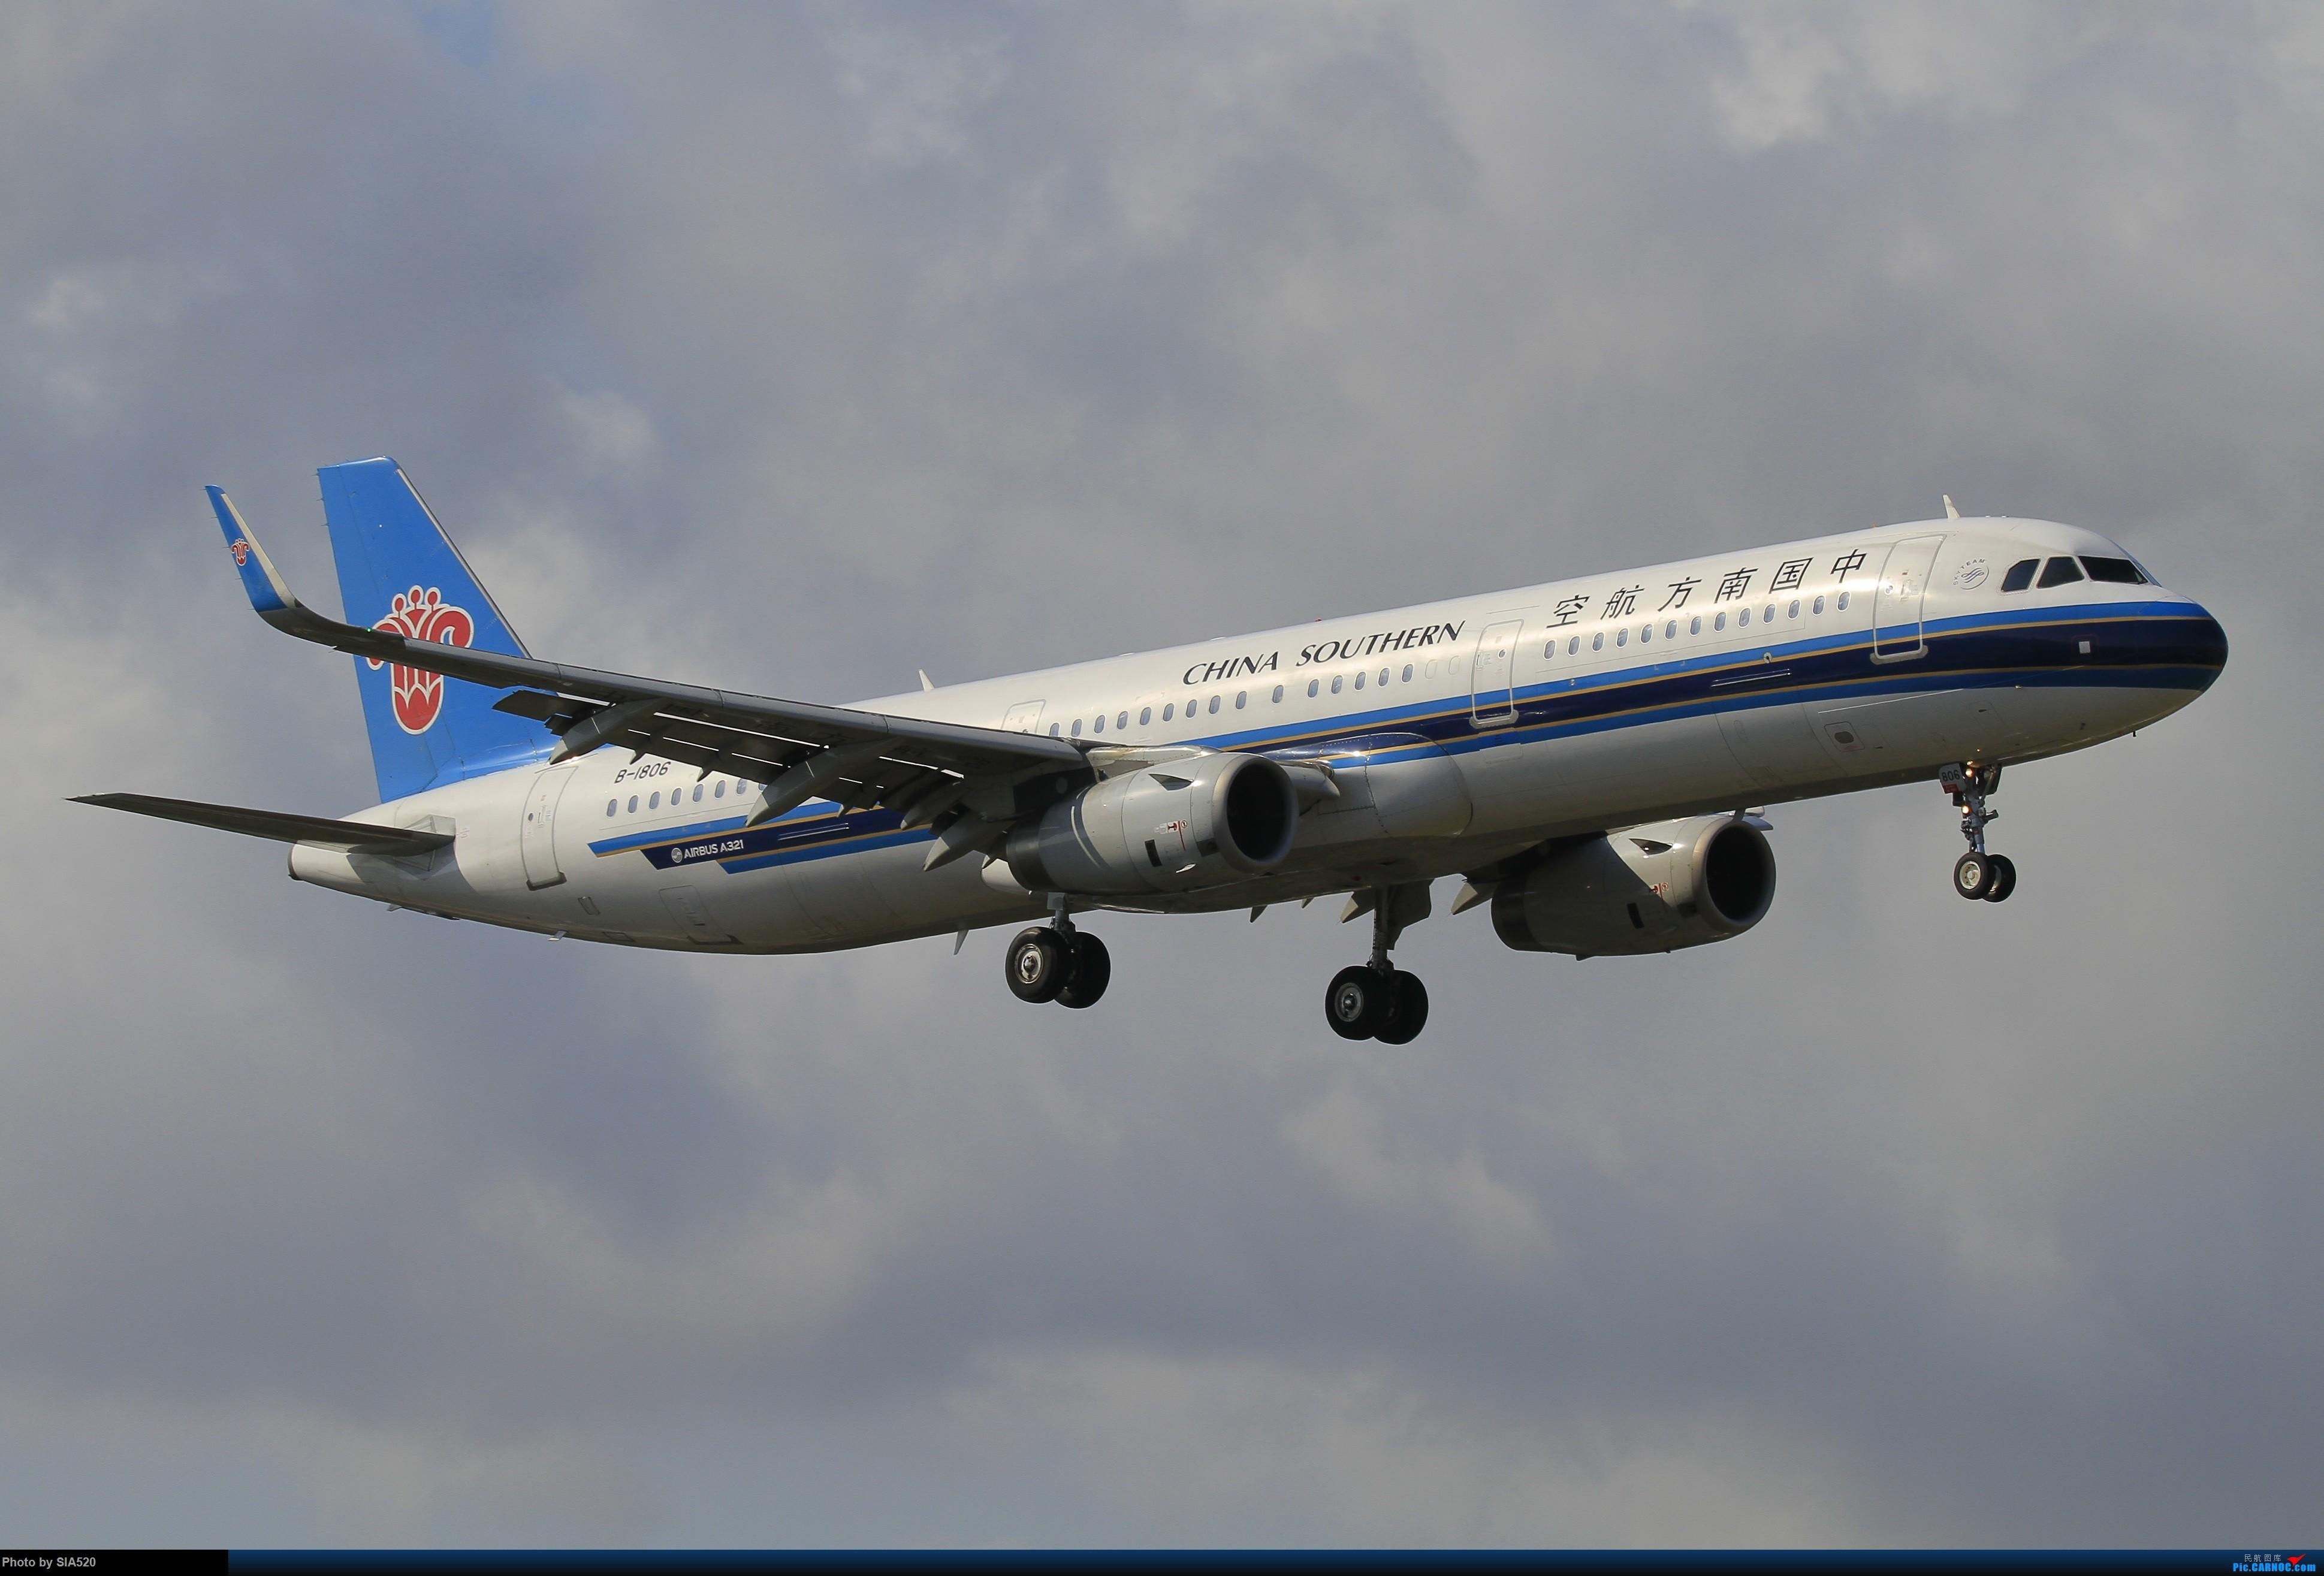 Re:[原创]北京人儿在三亚—600mm解锁凤凰 AIRBUS A321-200 B-1806 中国三亚凤凰国际机场